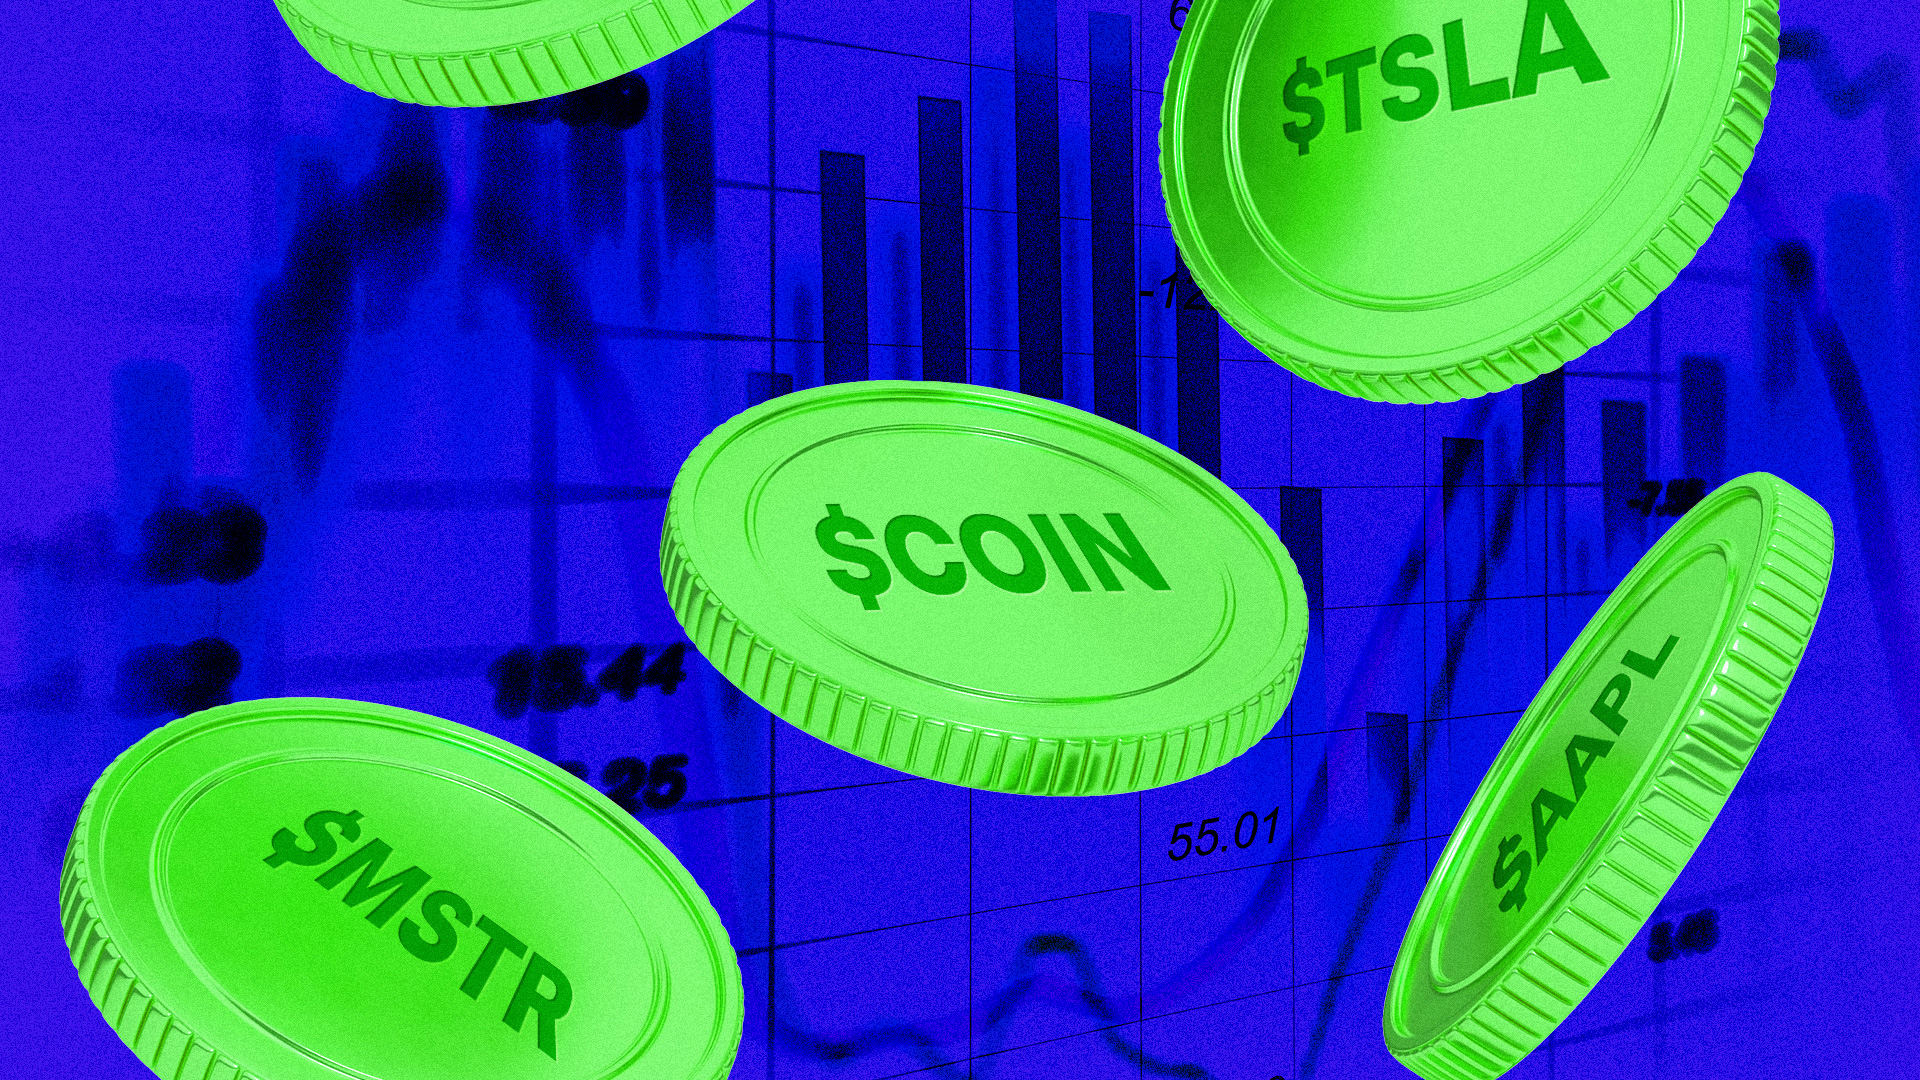 Digital Assets launches Solana-based tokenized stocks on FTX